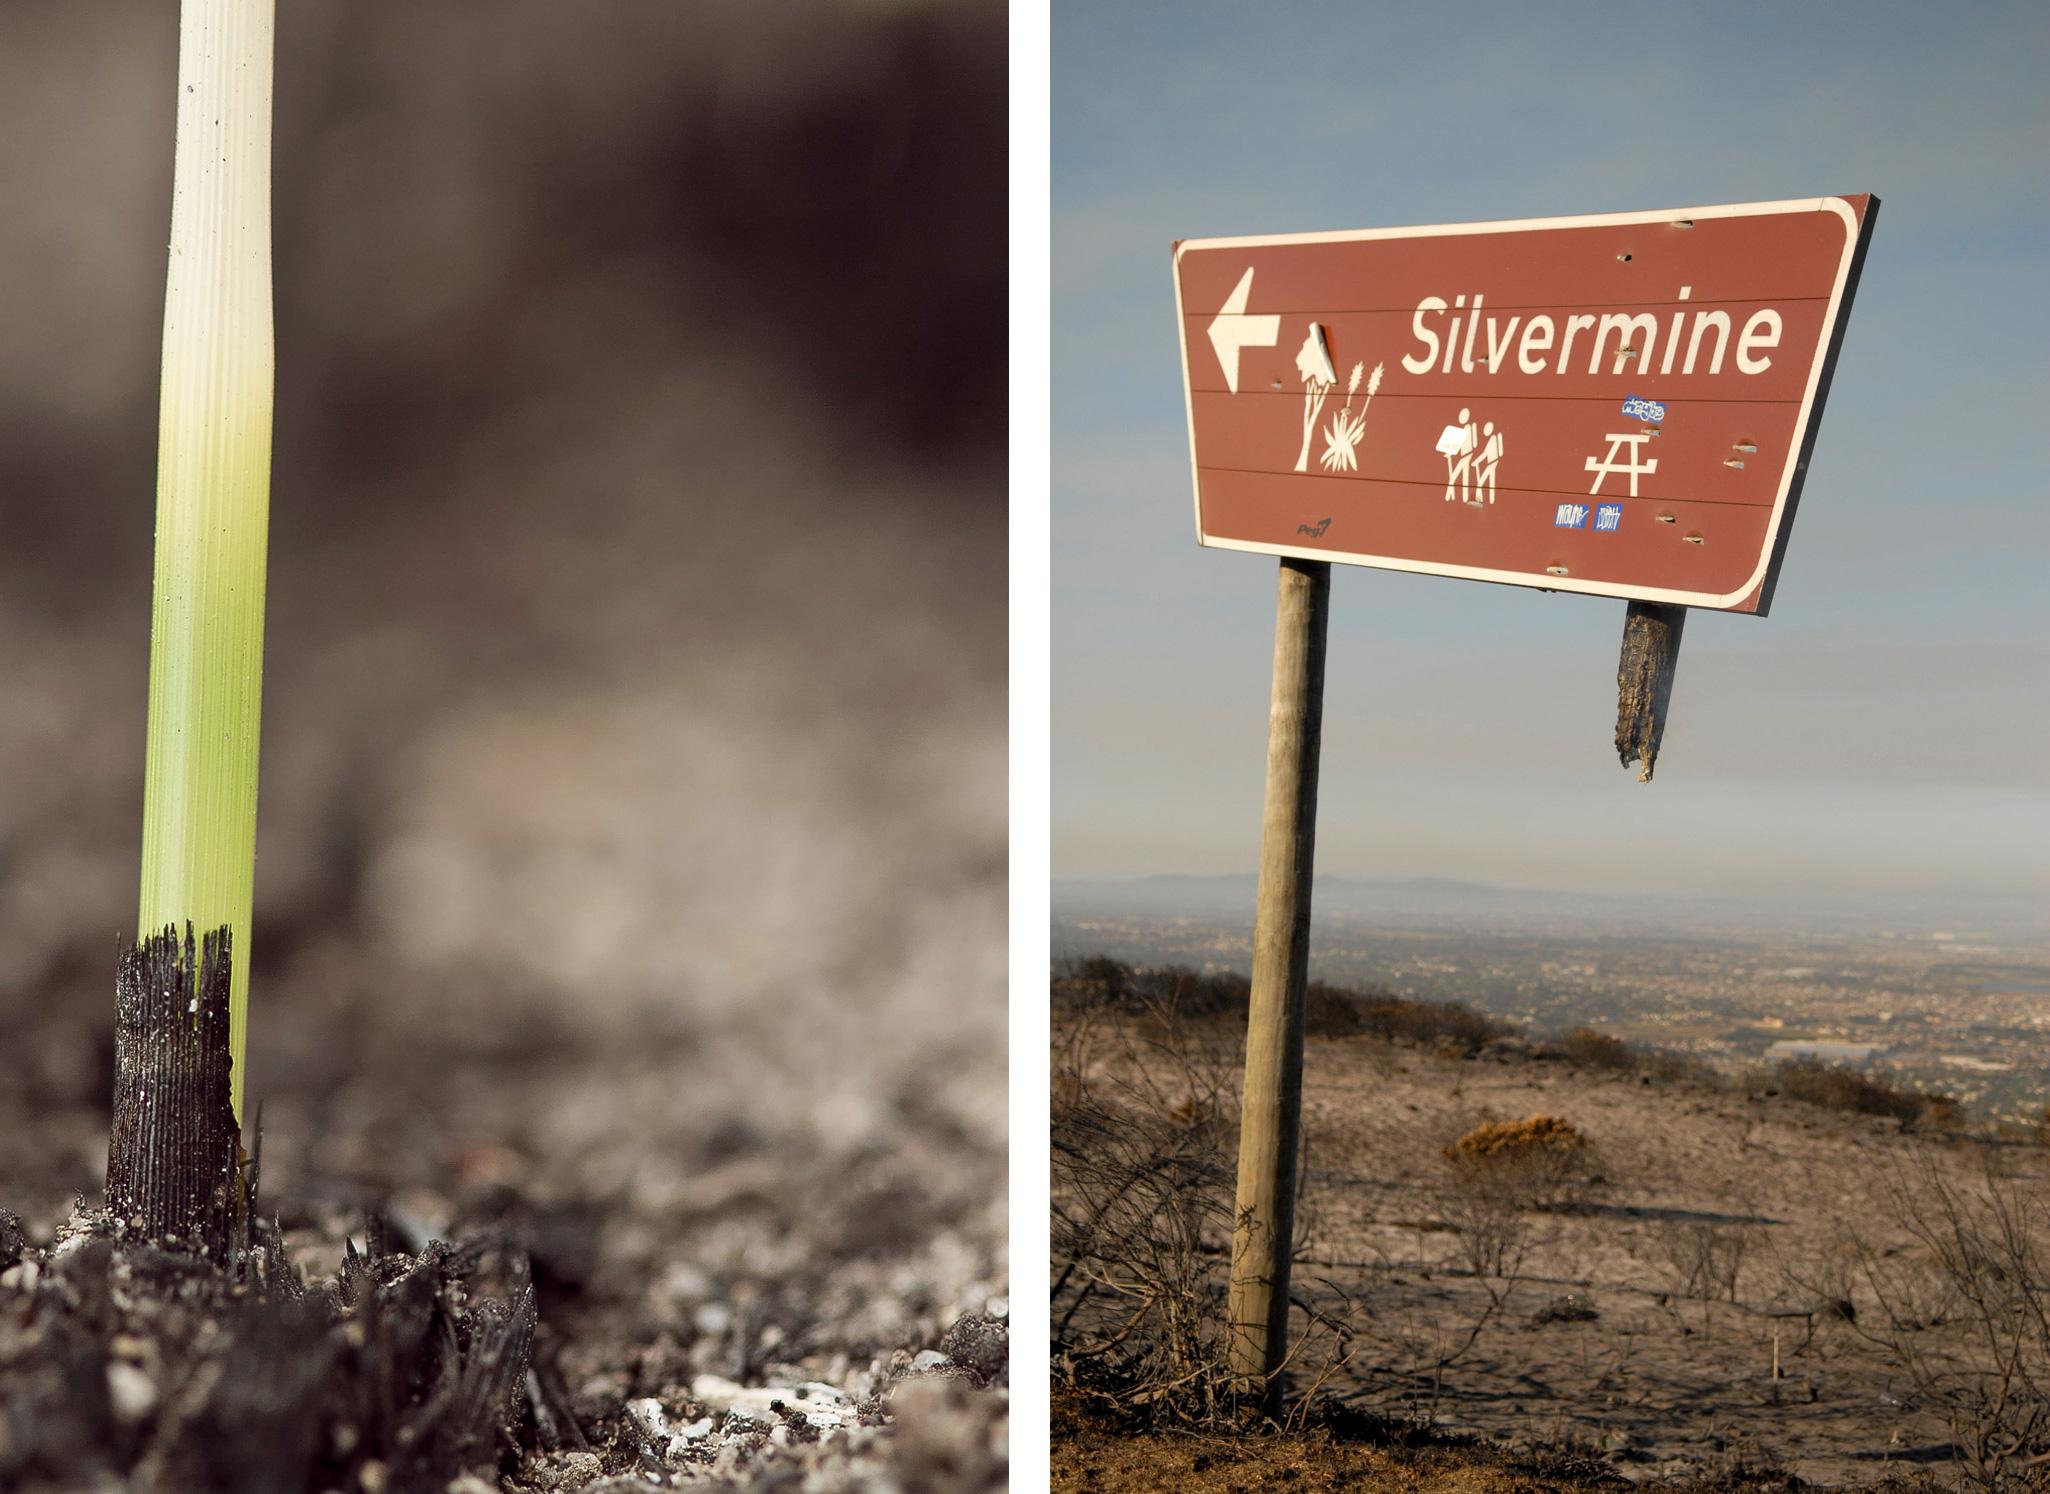 capefire-silvermine-regrowth-christian-boix-Anton-Crone-2